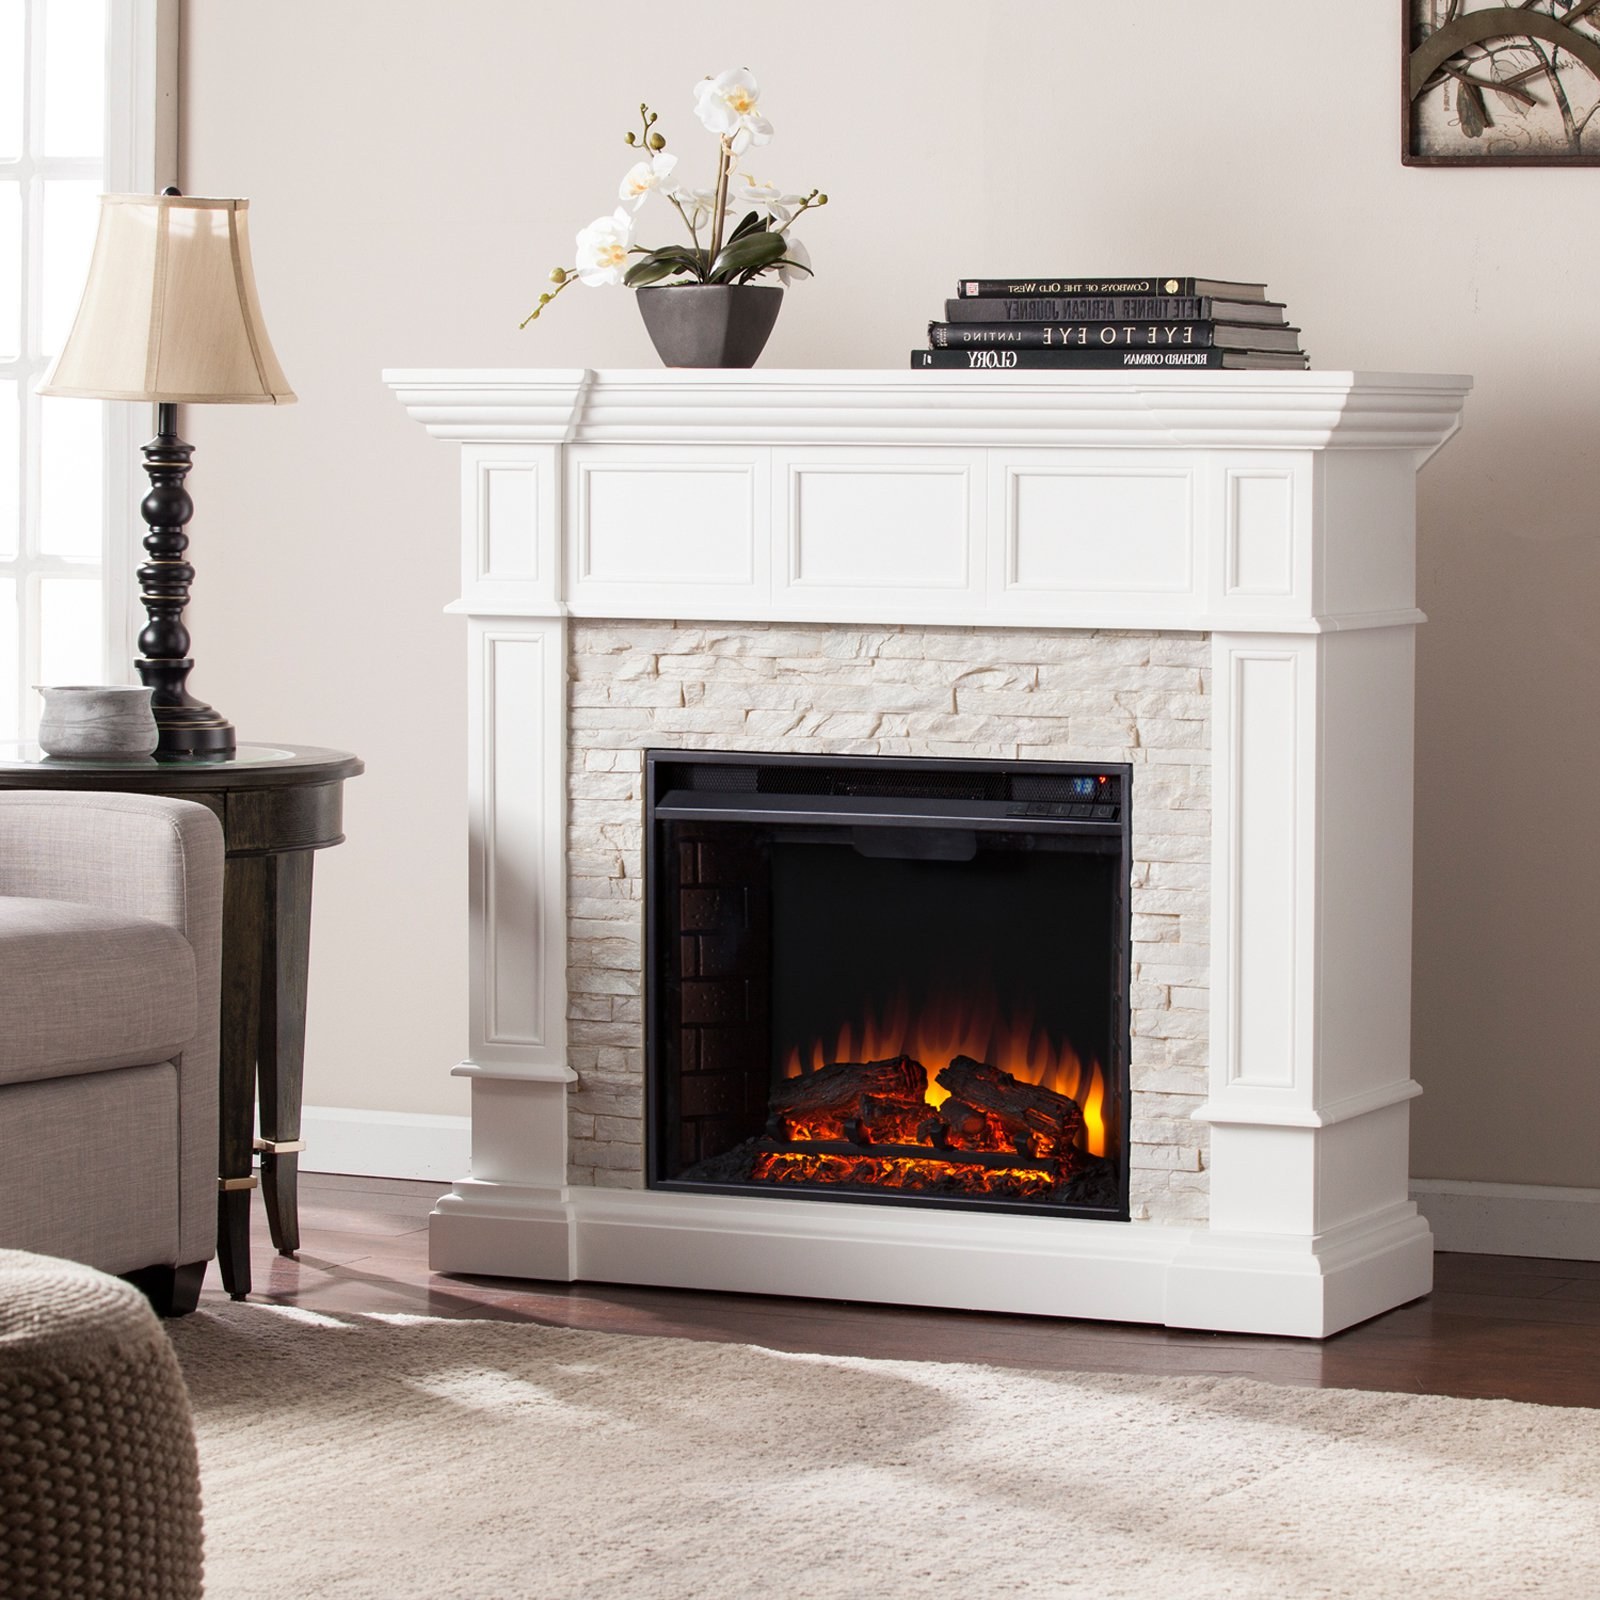 Southern Enterprises Merrimack Electric Fireplace